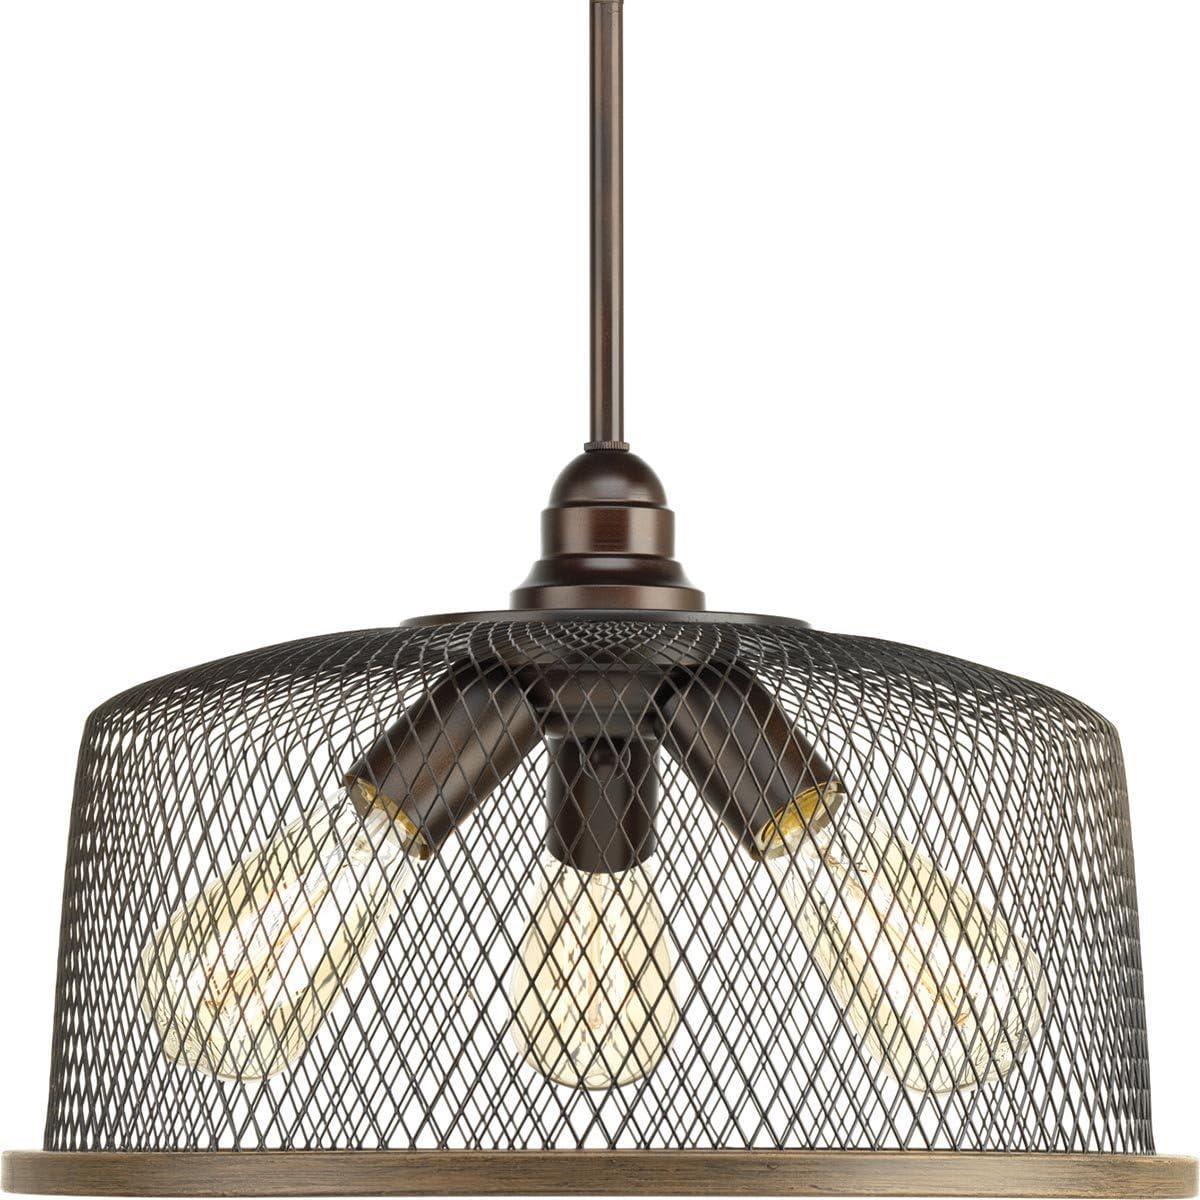 Progress Lowest price challenge Lighting P500079-020 Tilley Pendant Brown Special sale item Three-Light